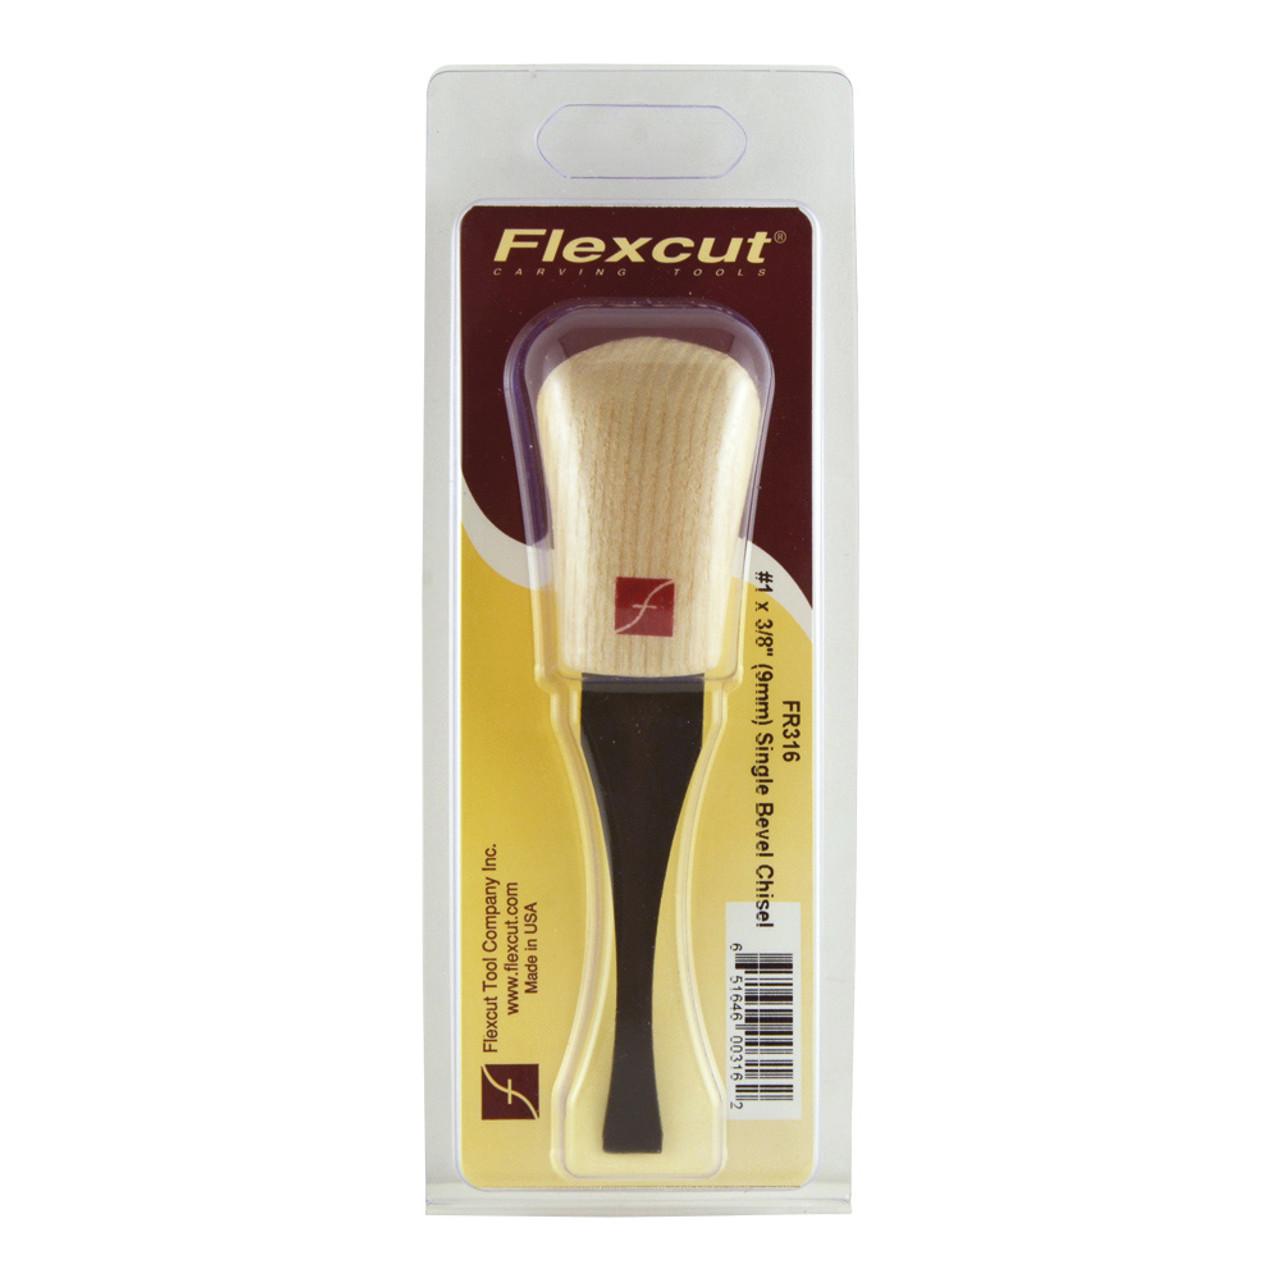 "Flexcut FR316 Palm Carving  #1 x 3/8"" Chisel shown in it's original package."